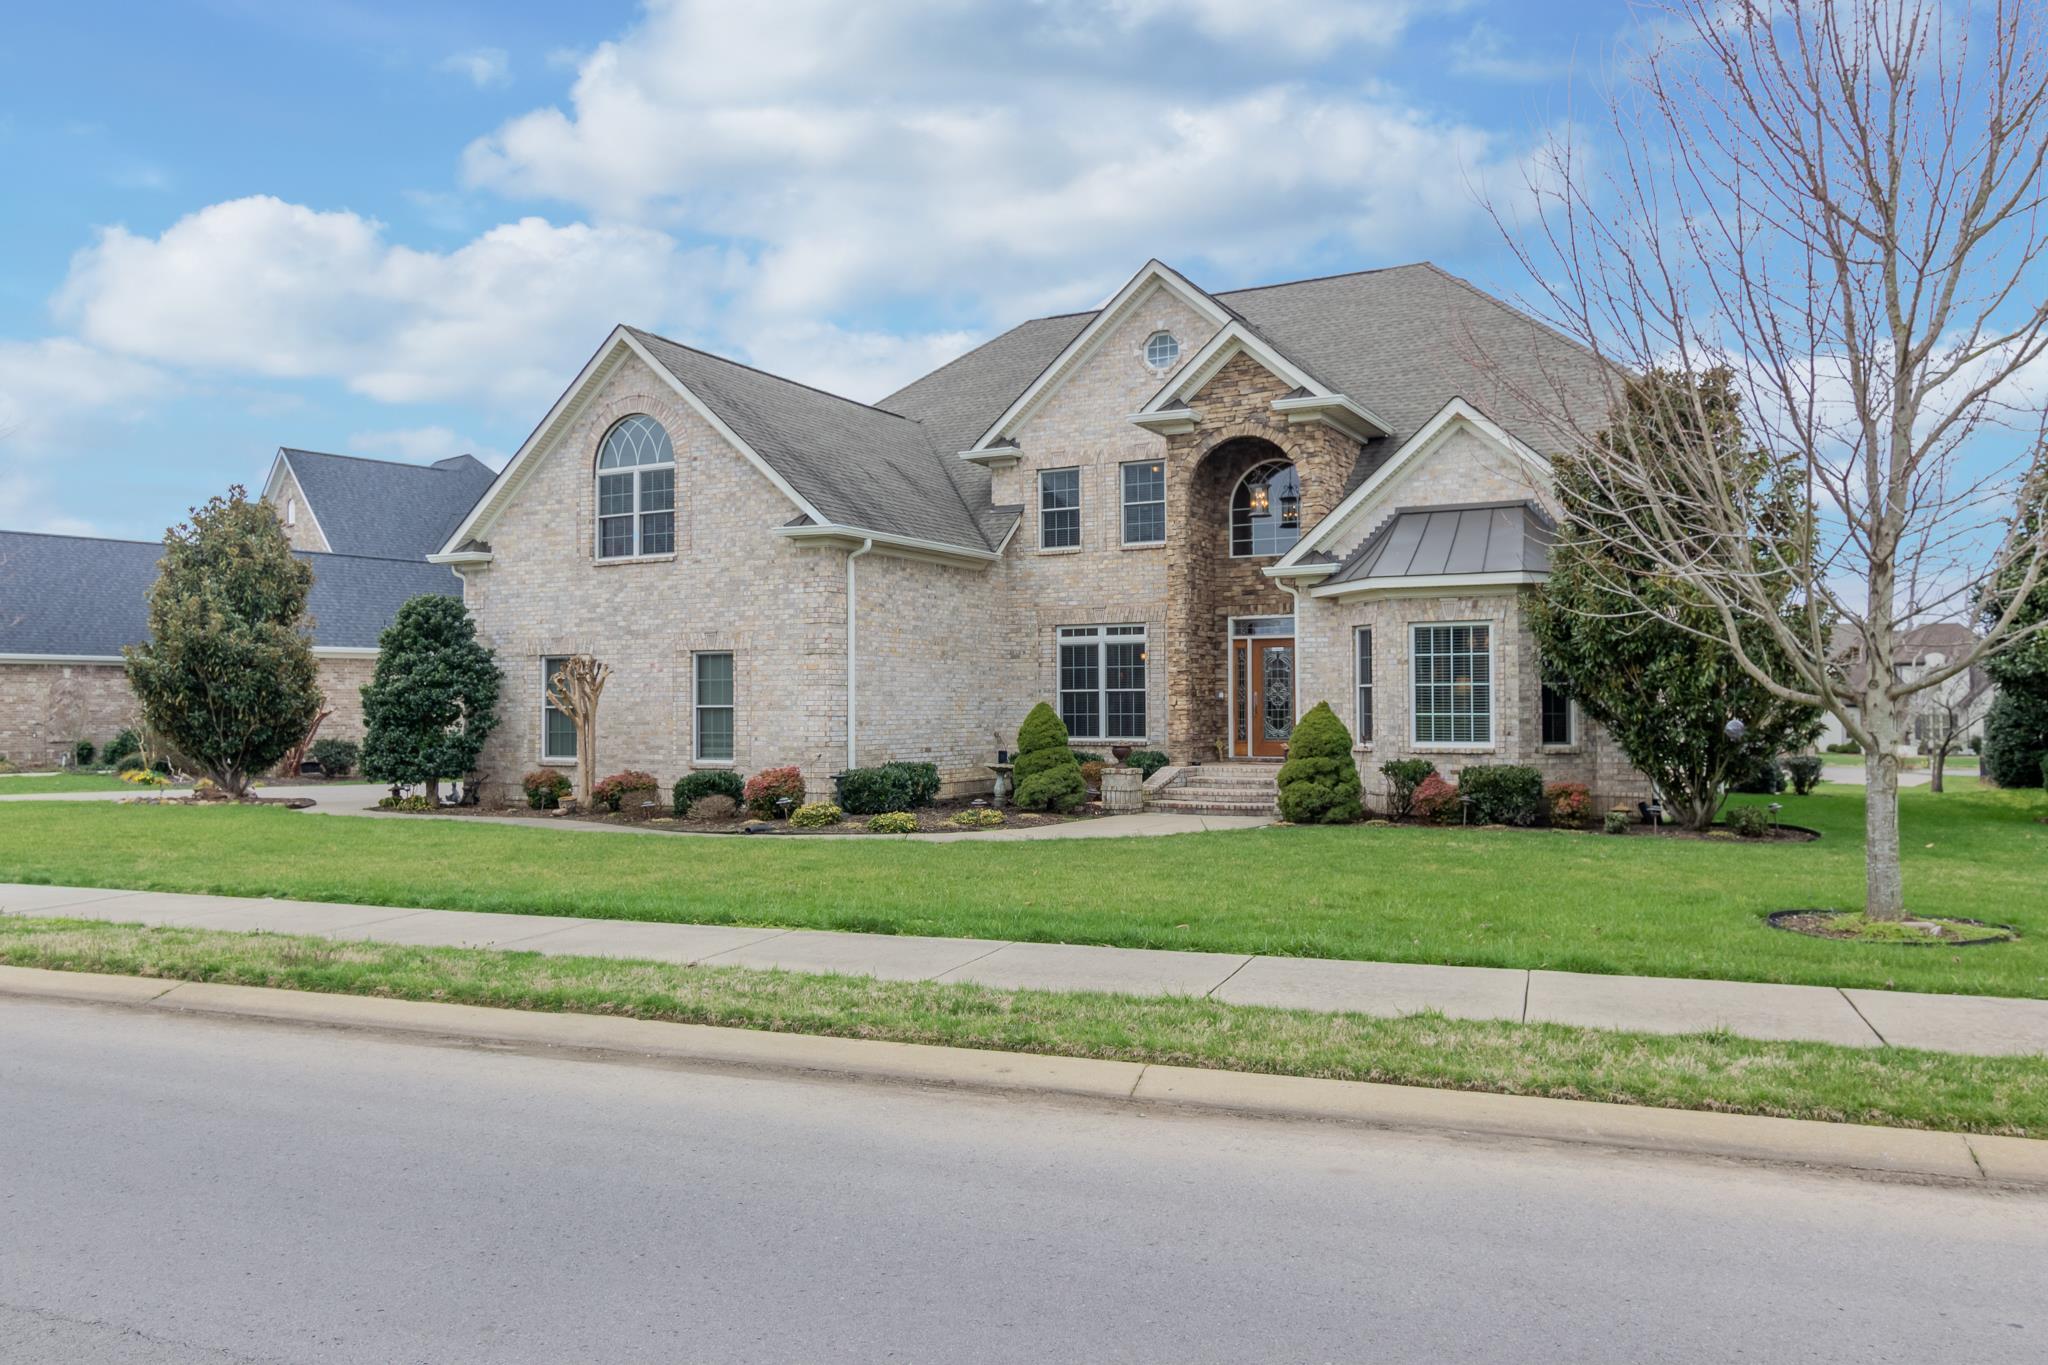 3323 Vintage Grove Pkwy, Murfreesboro, TN 37130 - Murfreesboro, TN real estate listing